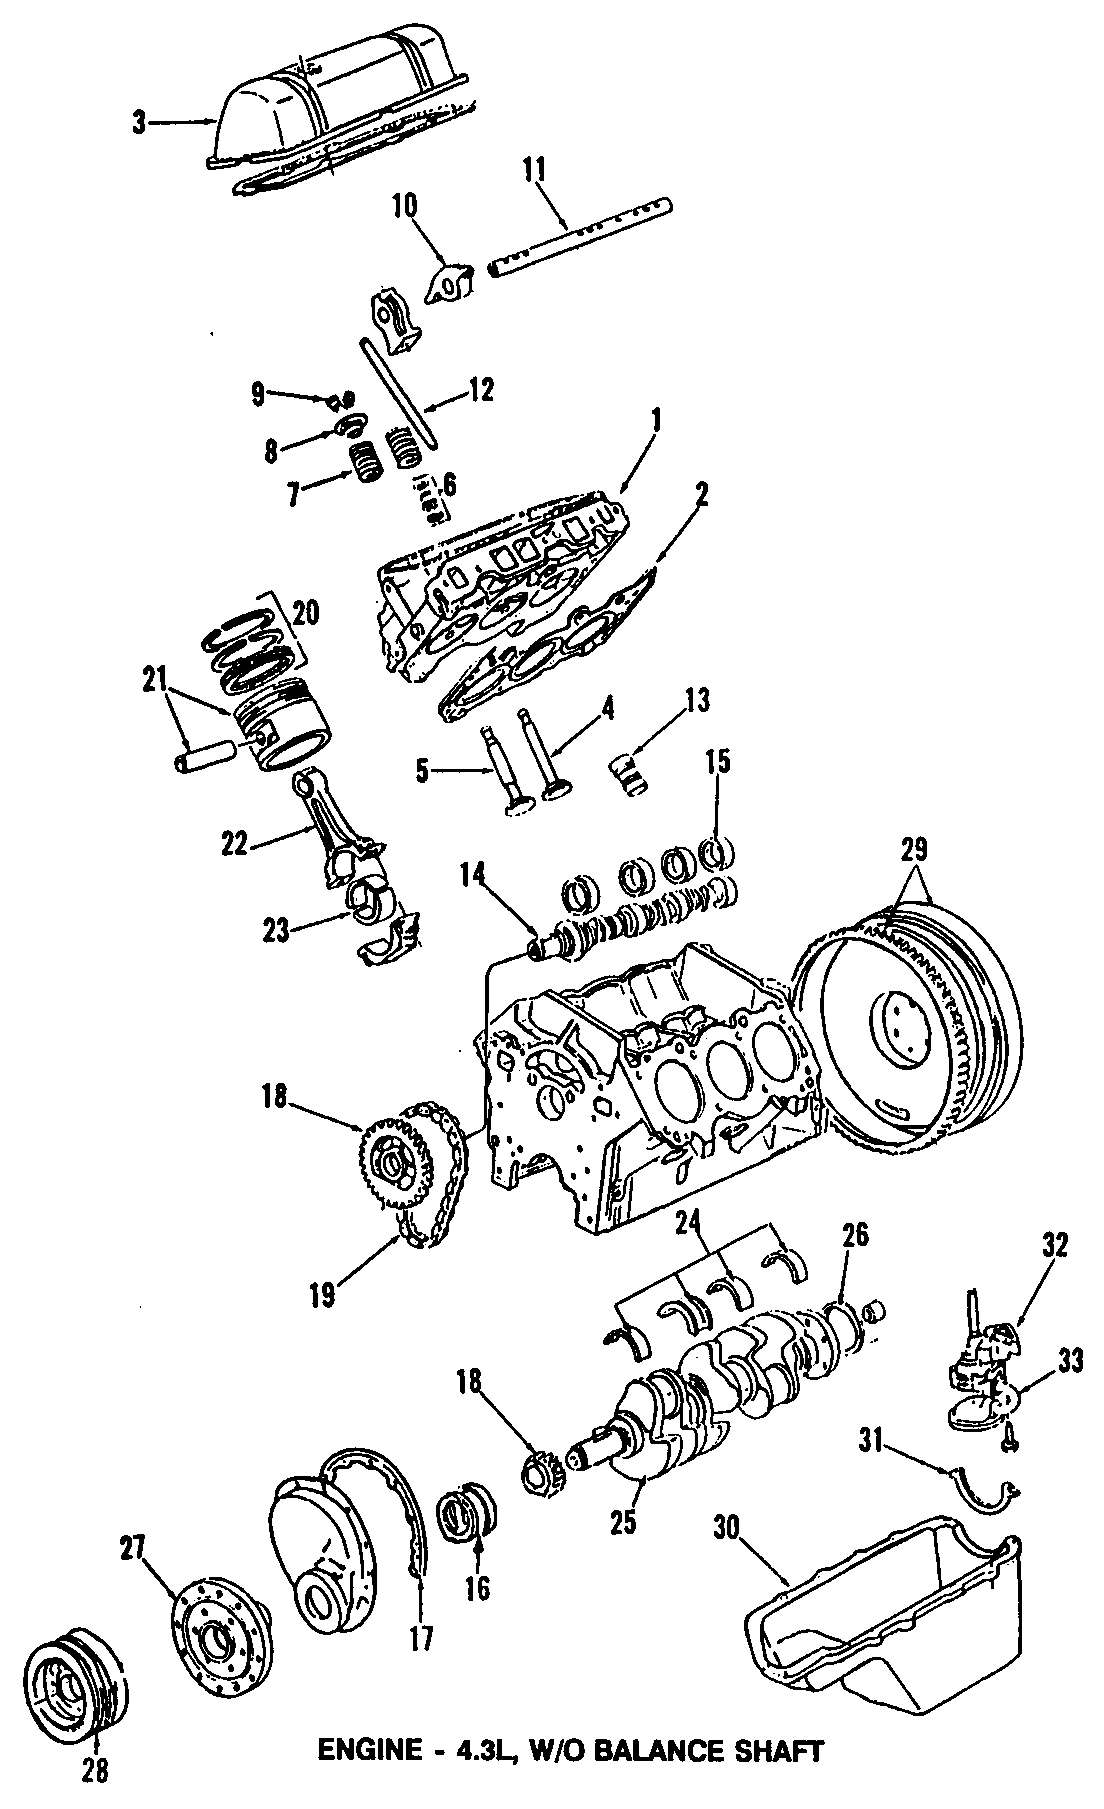 Chevrolet Caprice Engine Cylinder Head Gasket